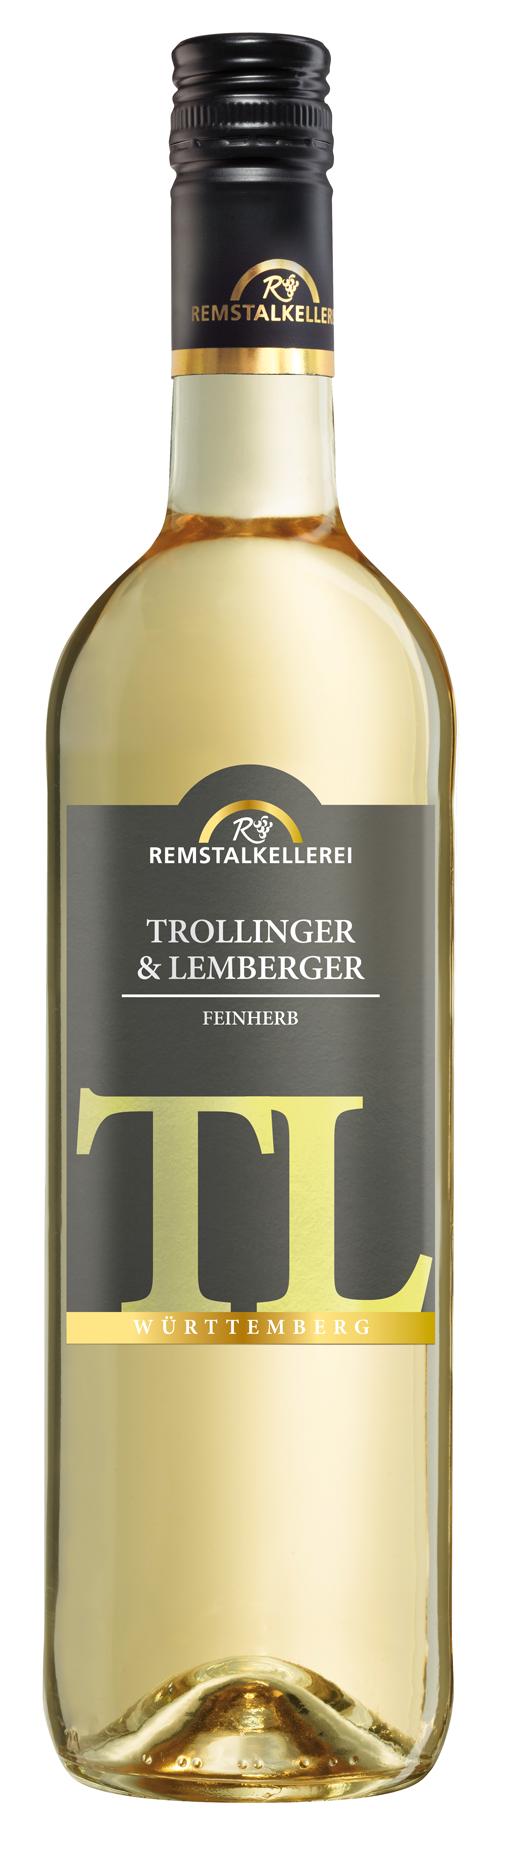 "Trollinger mit Lemberger ""TL"" Blanc de Noir"